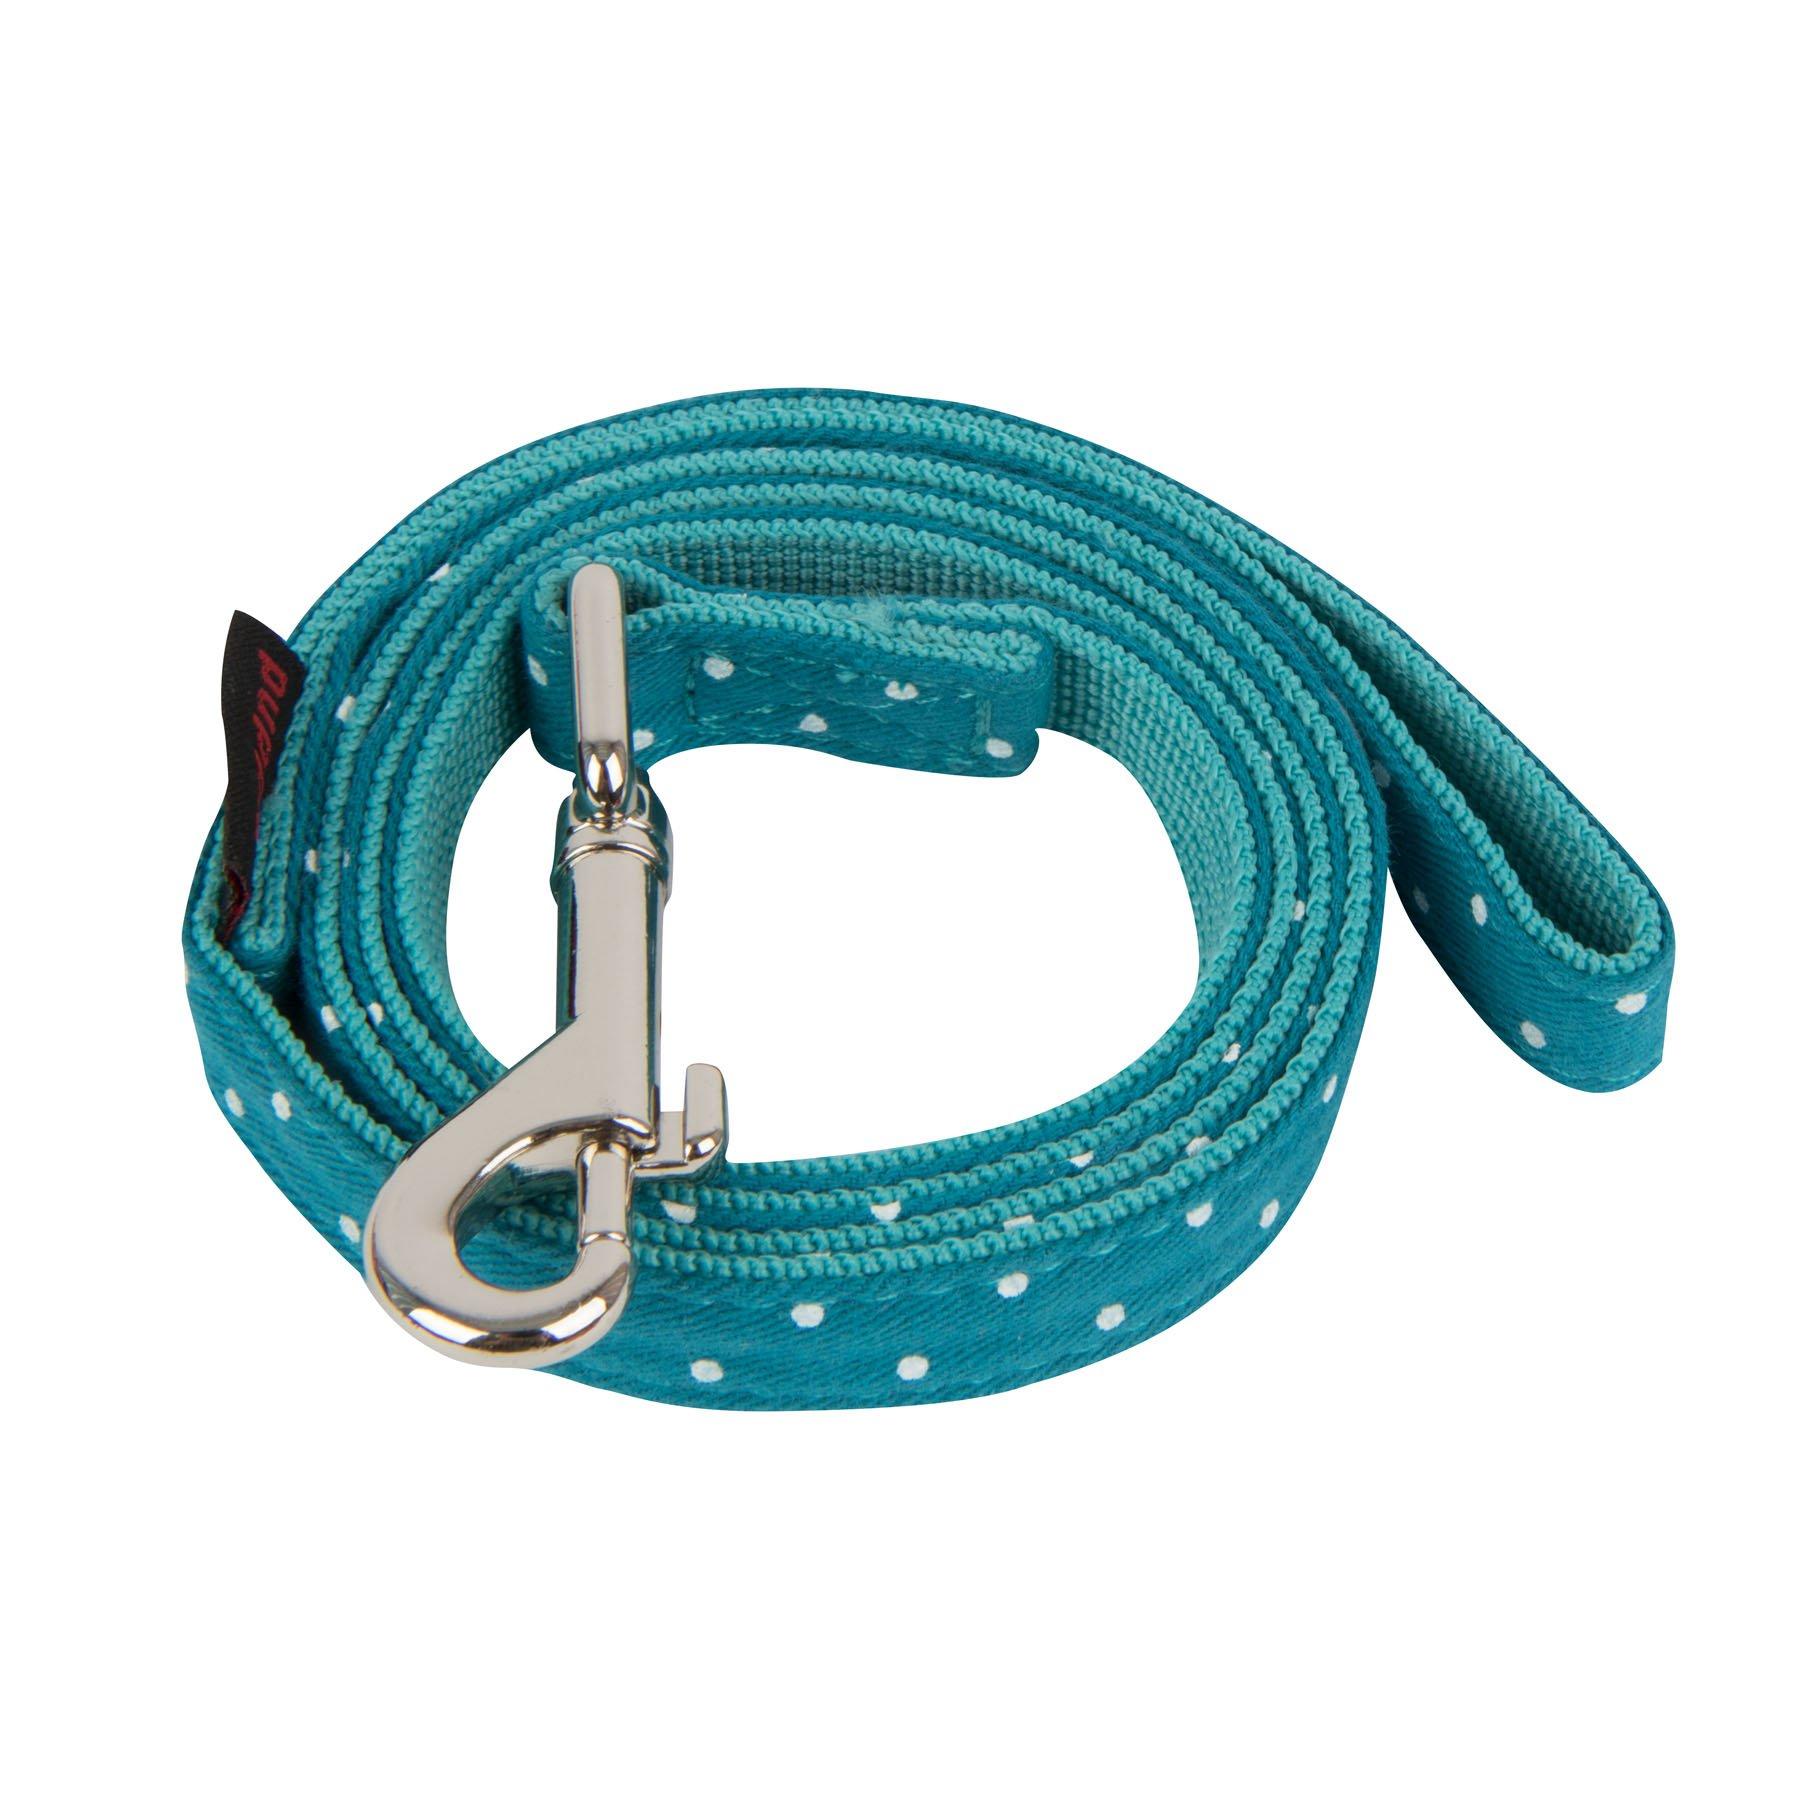 Puppia PARA-AL1529-TE-M Teal Dotty Lead II Pet-Leashes, Medium